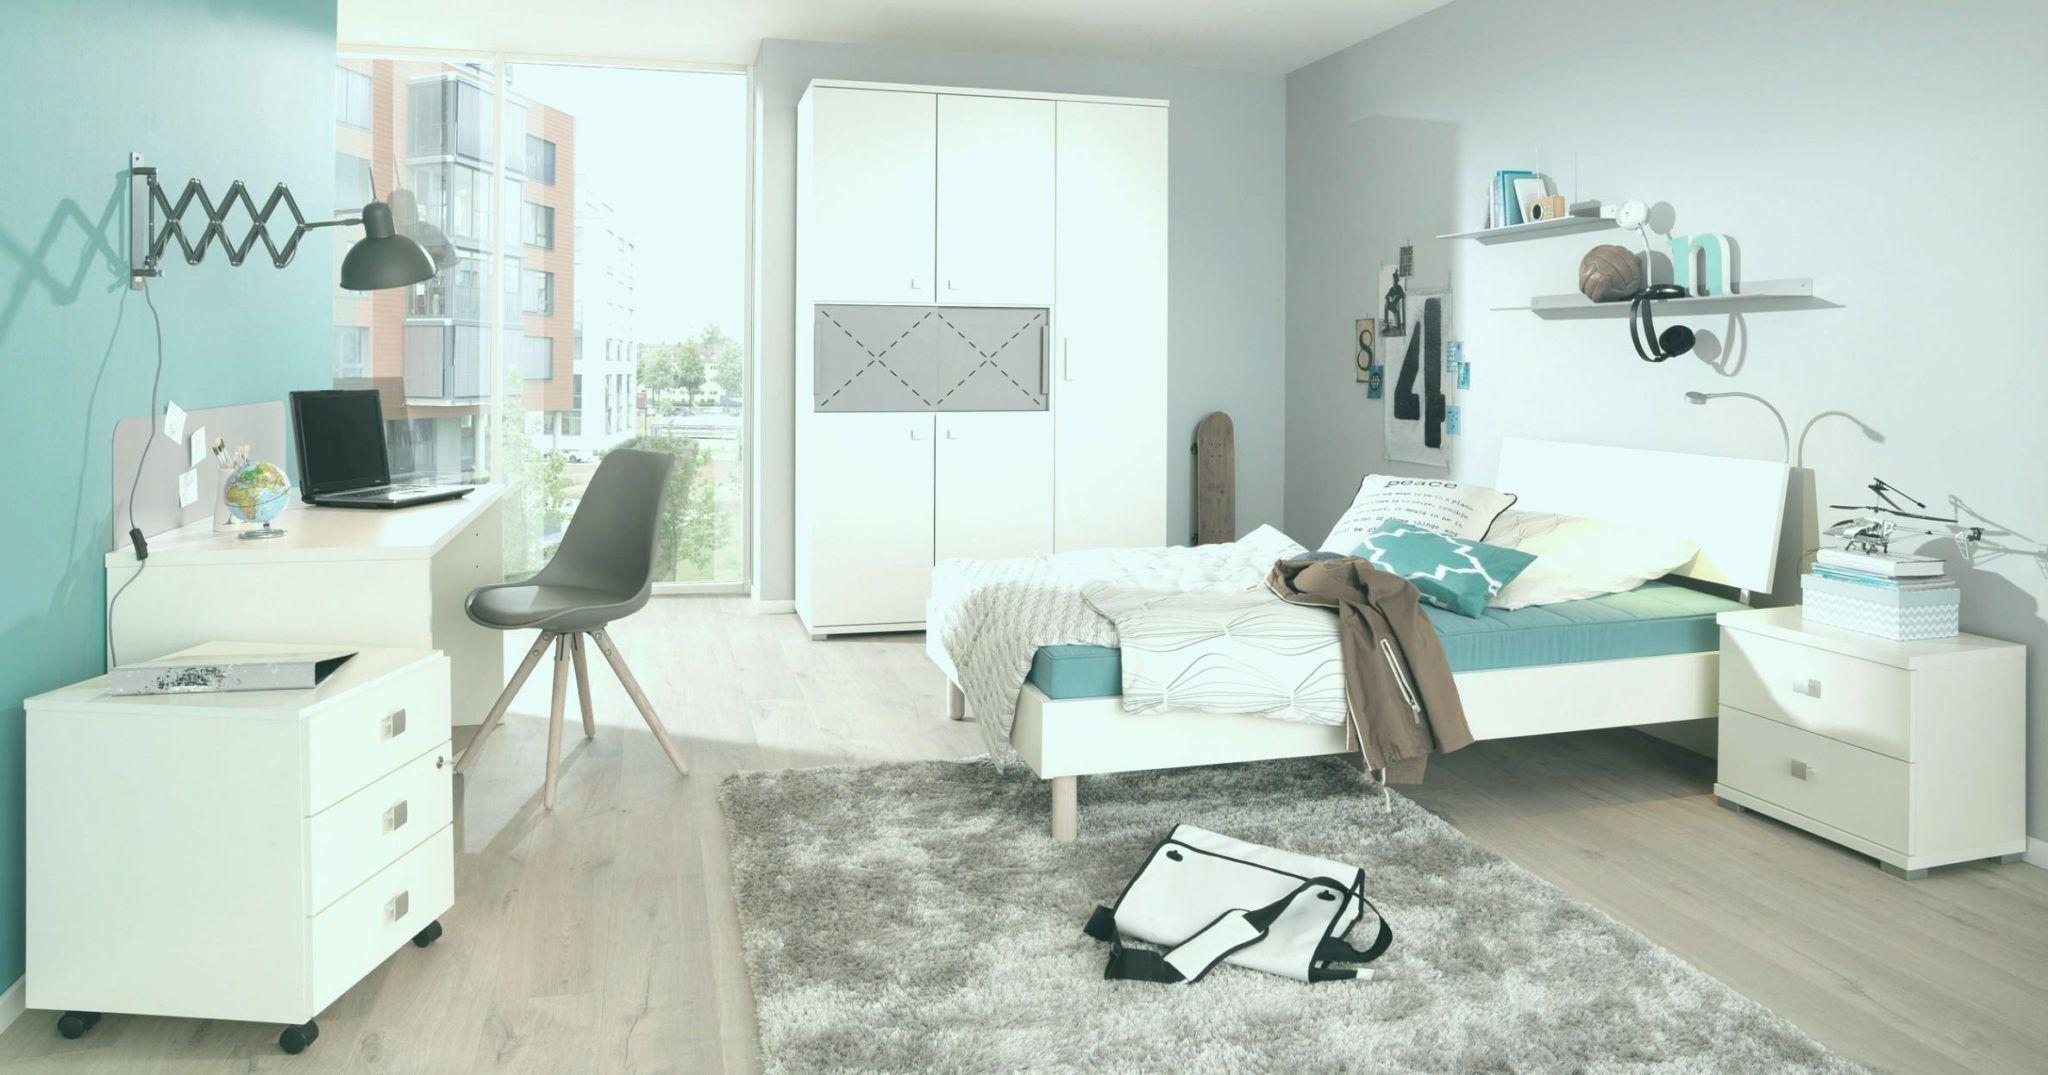 Wunderbar Jungen Schlafzimmer Komplett | Sage bedroom, Home decor ...